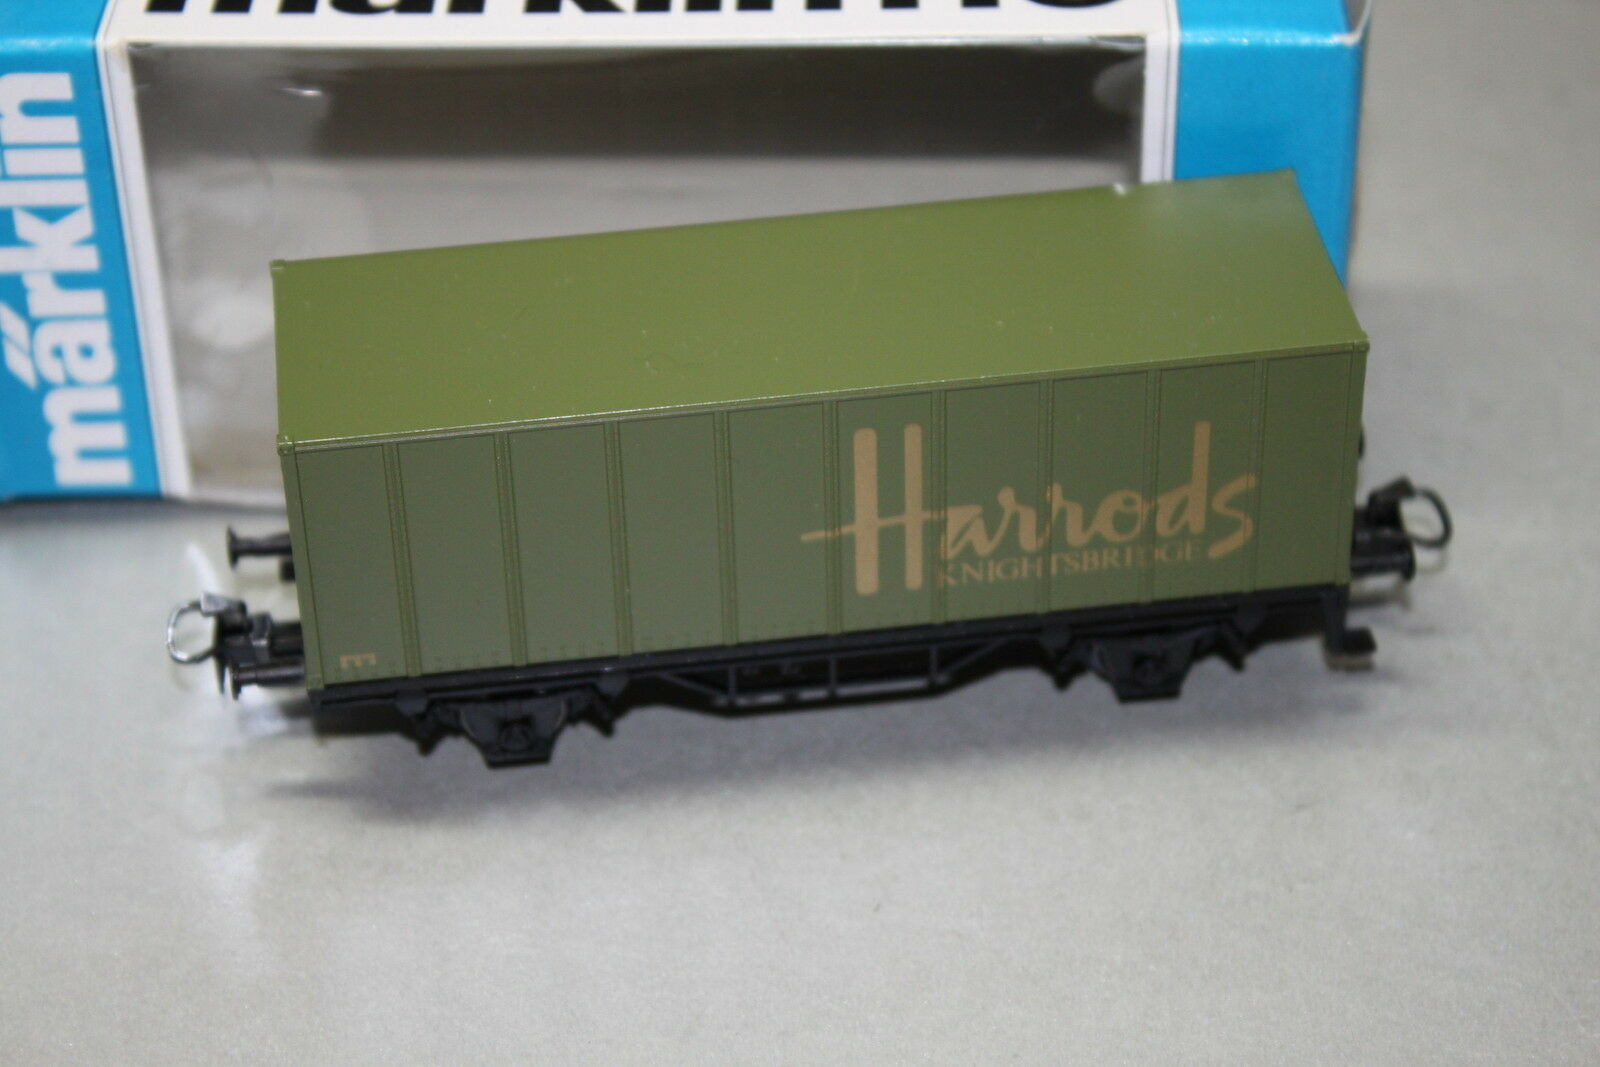 Märklin 92502 2-Camion Container Carrello  HARRODS KNIGHTSBRIDGE  traccia h0 OVP